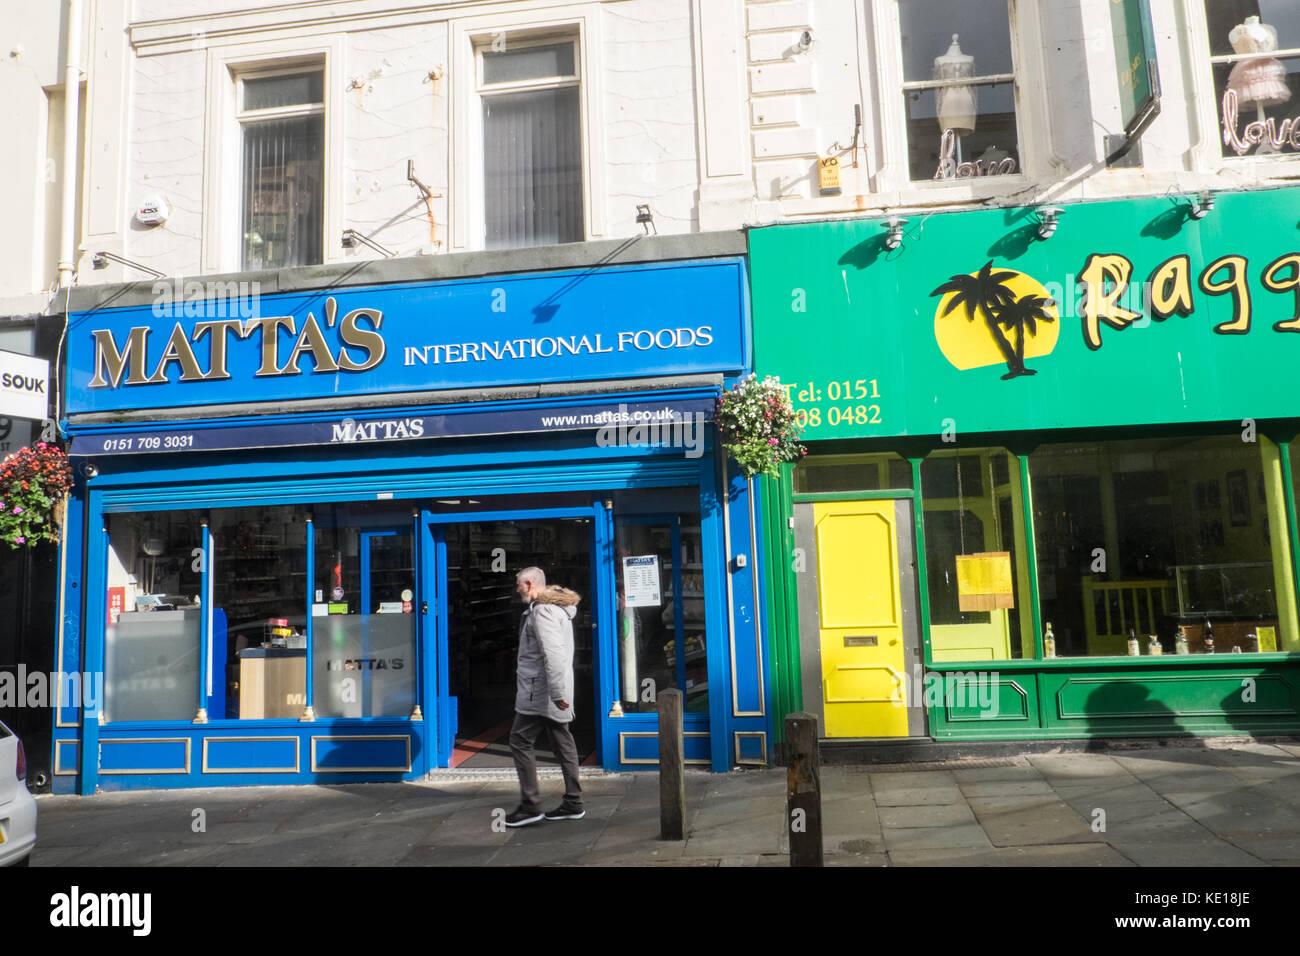 Matta's International,food,outlet,Bold Street,Liverpool,city,Merseyside,England,Britain,British,GB,UK,U.K.,Europe, - Stock Image